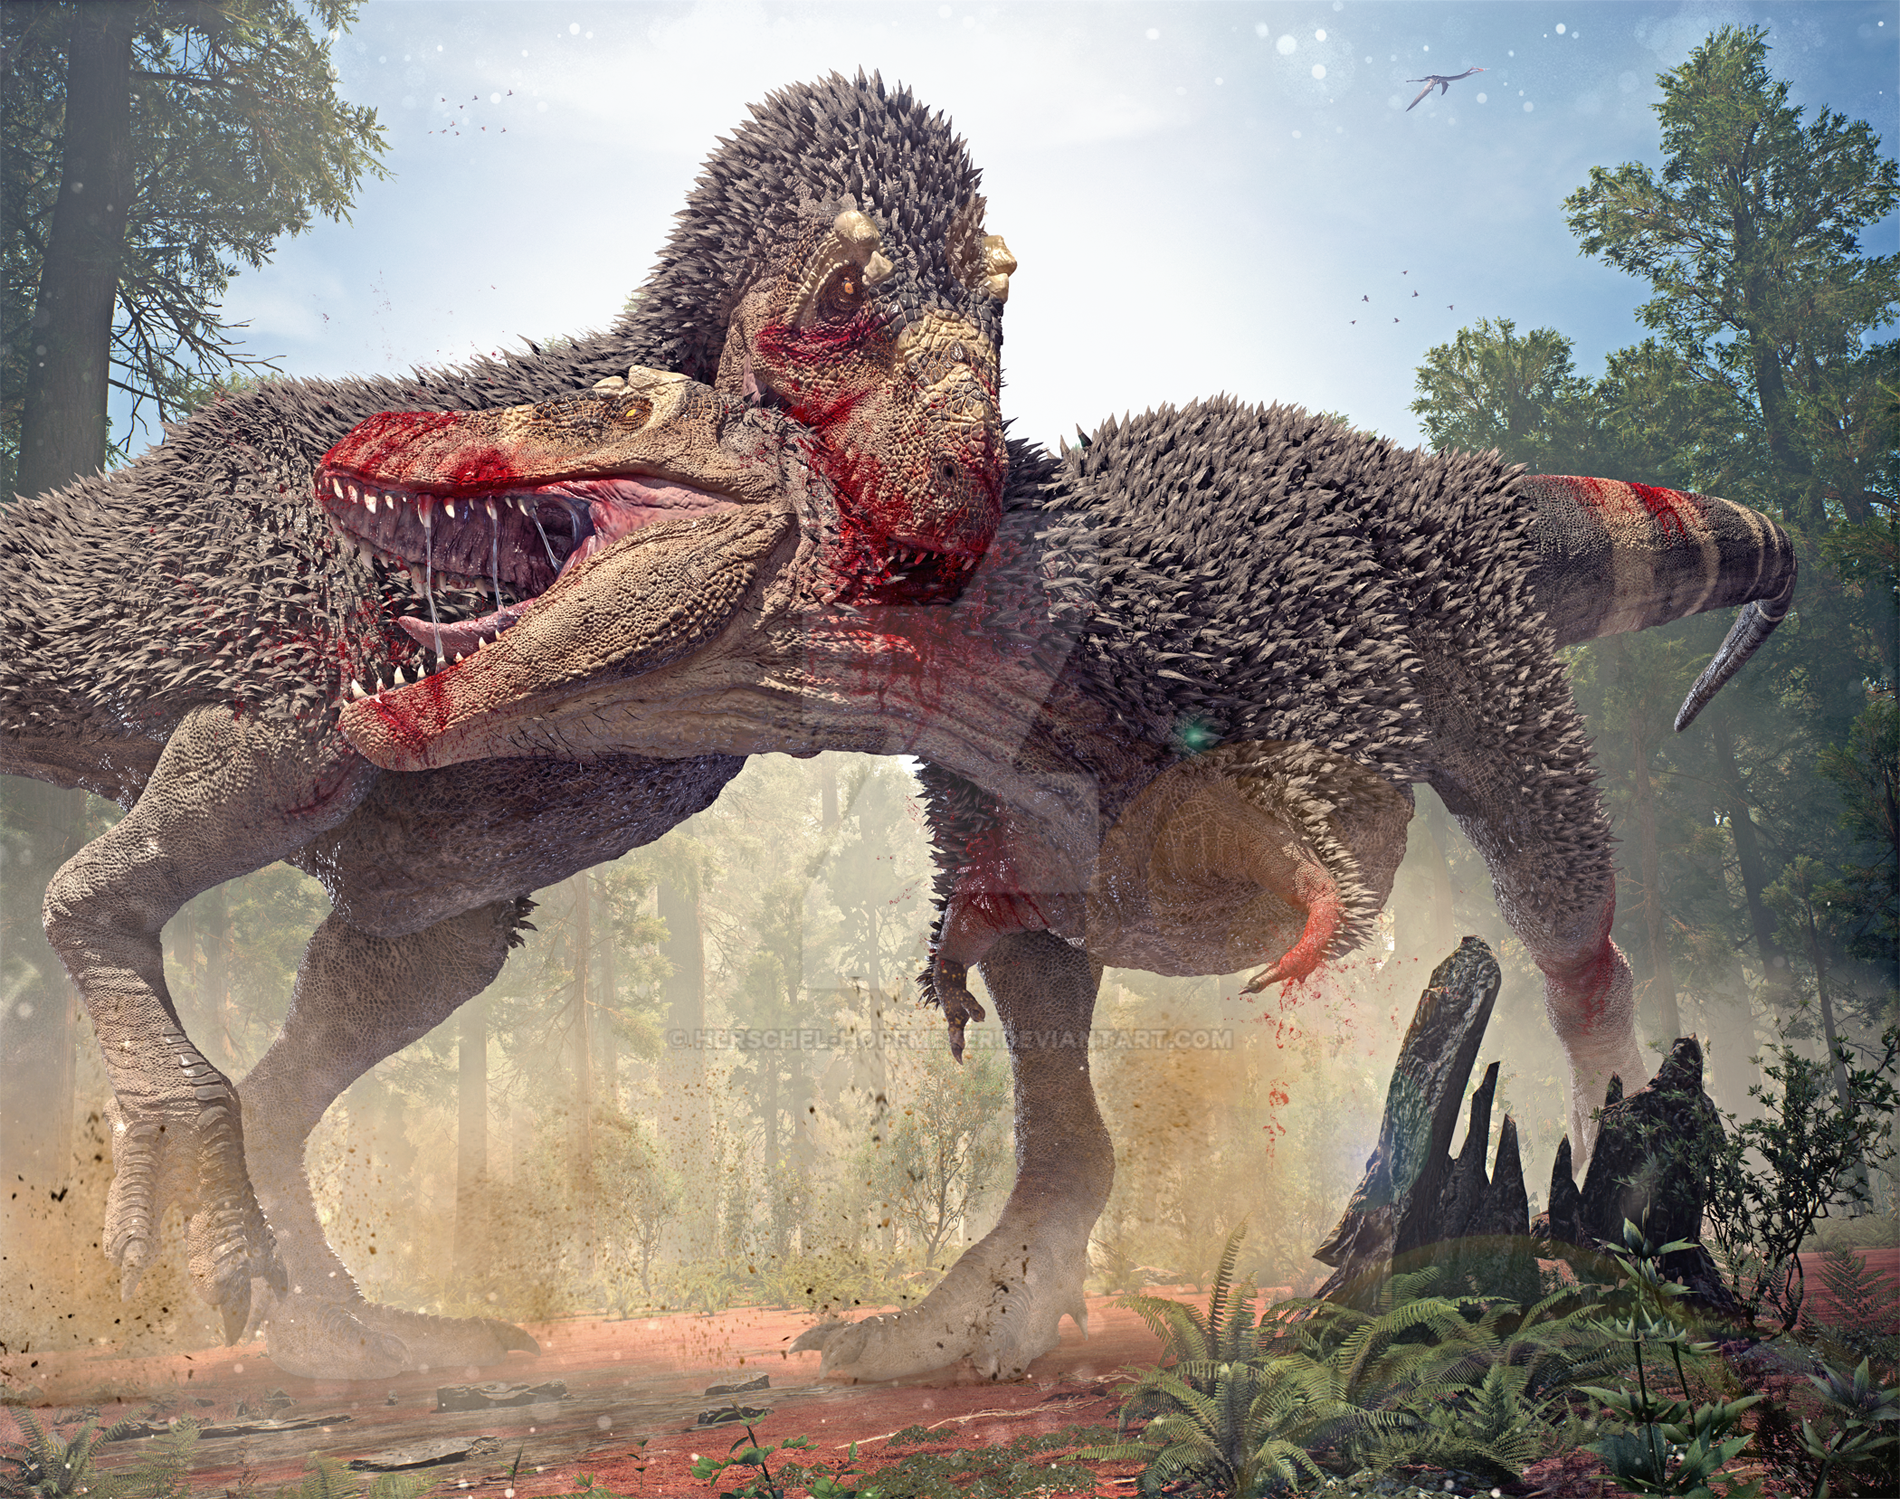 Tyrannosaurus and Prey by EldarZakirov on DeviantArt